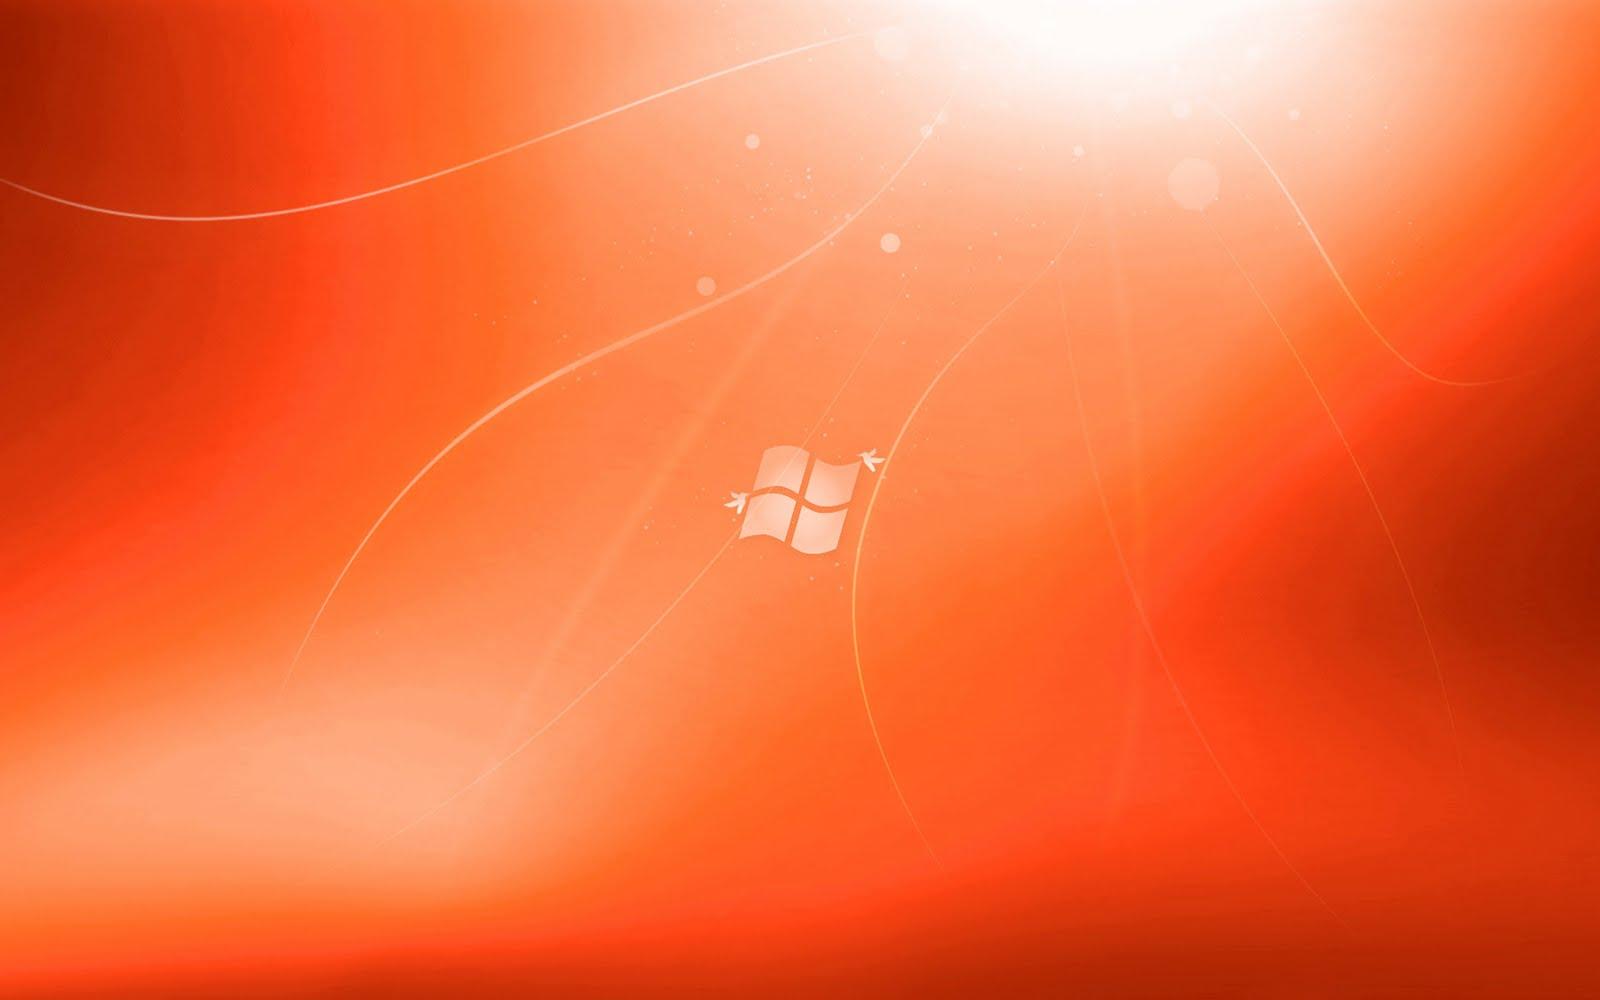 http://3.bp.blogspot.com/_Qc6aMdLT994/S6pU2XetjkI/AAAAAAAAFGE/9r_wsEffUm0/s1600/Windows+7+ultimate+collection+of+wallpapers+(2).jpg